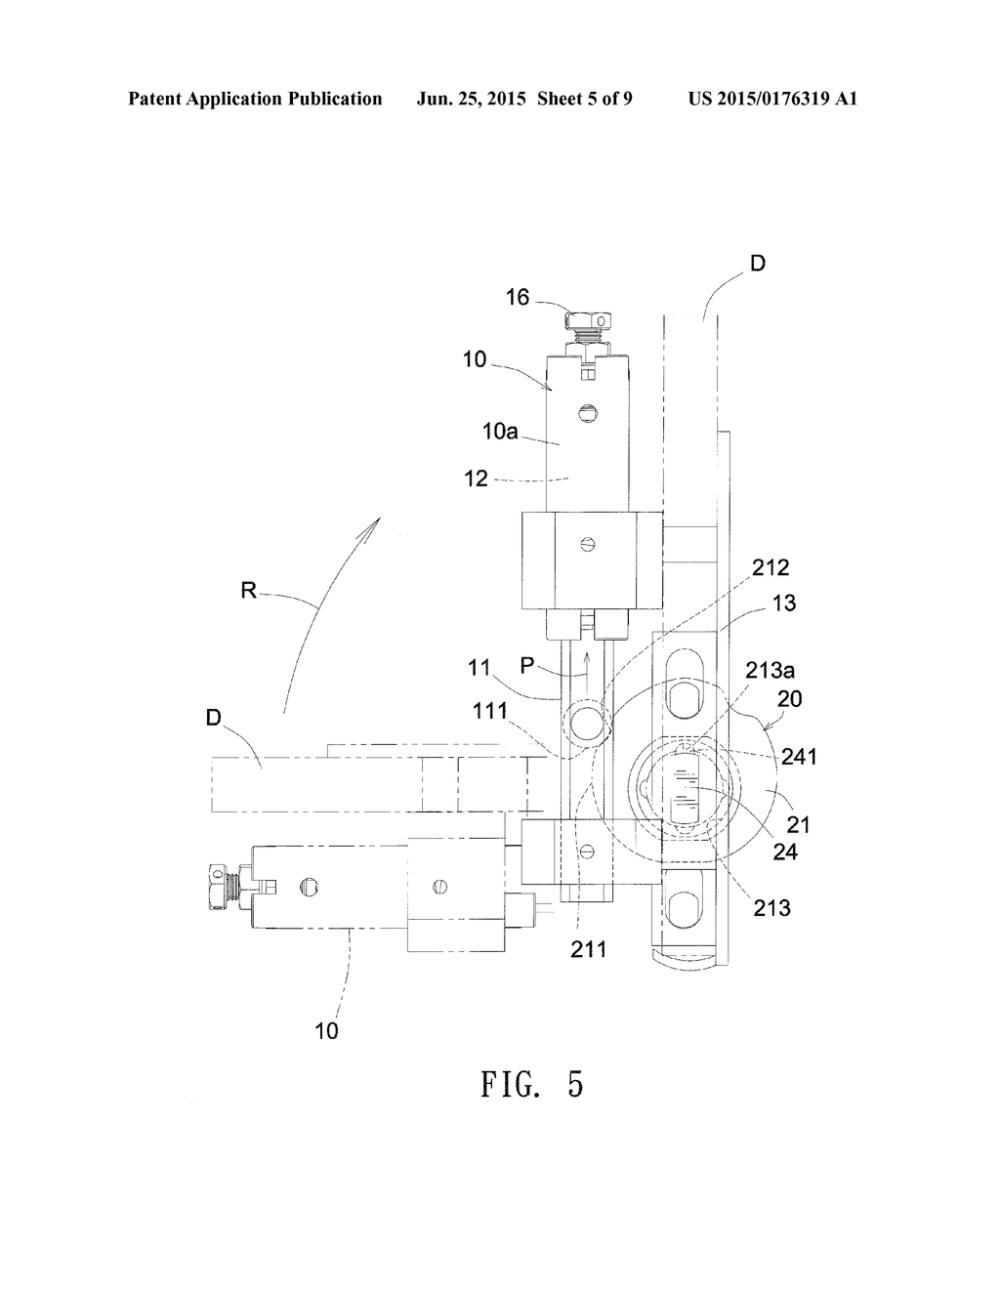 medium resolution of cam type oil free automatic door closer diagram schematic and image 06